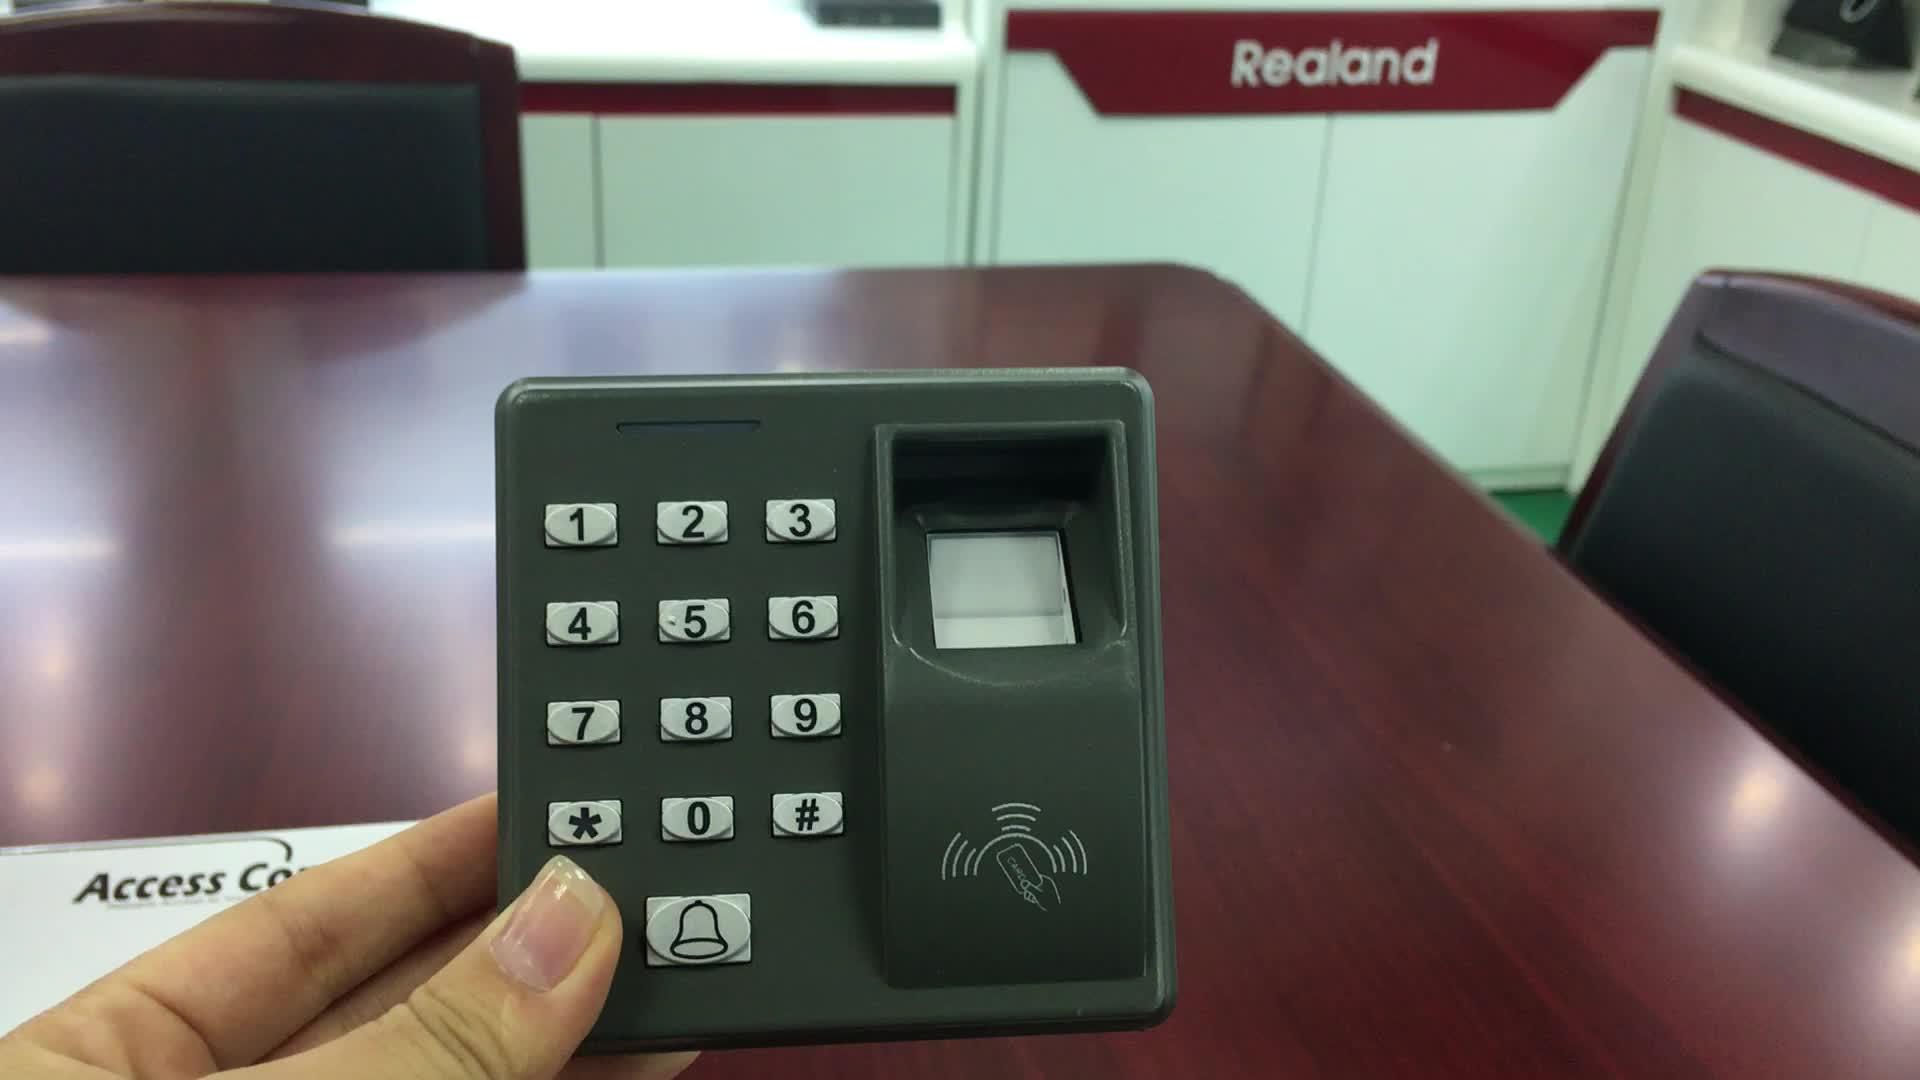 Realand M-F100バイオメトリックデバイススワイプカードエントリーシステム指紋ドアアクセス制御